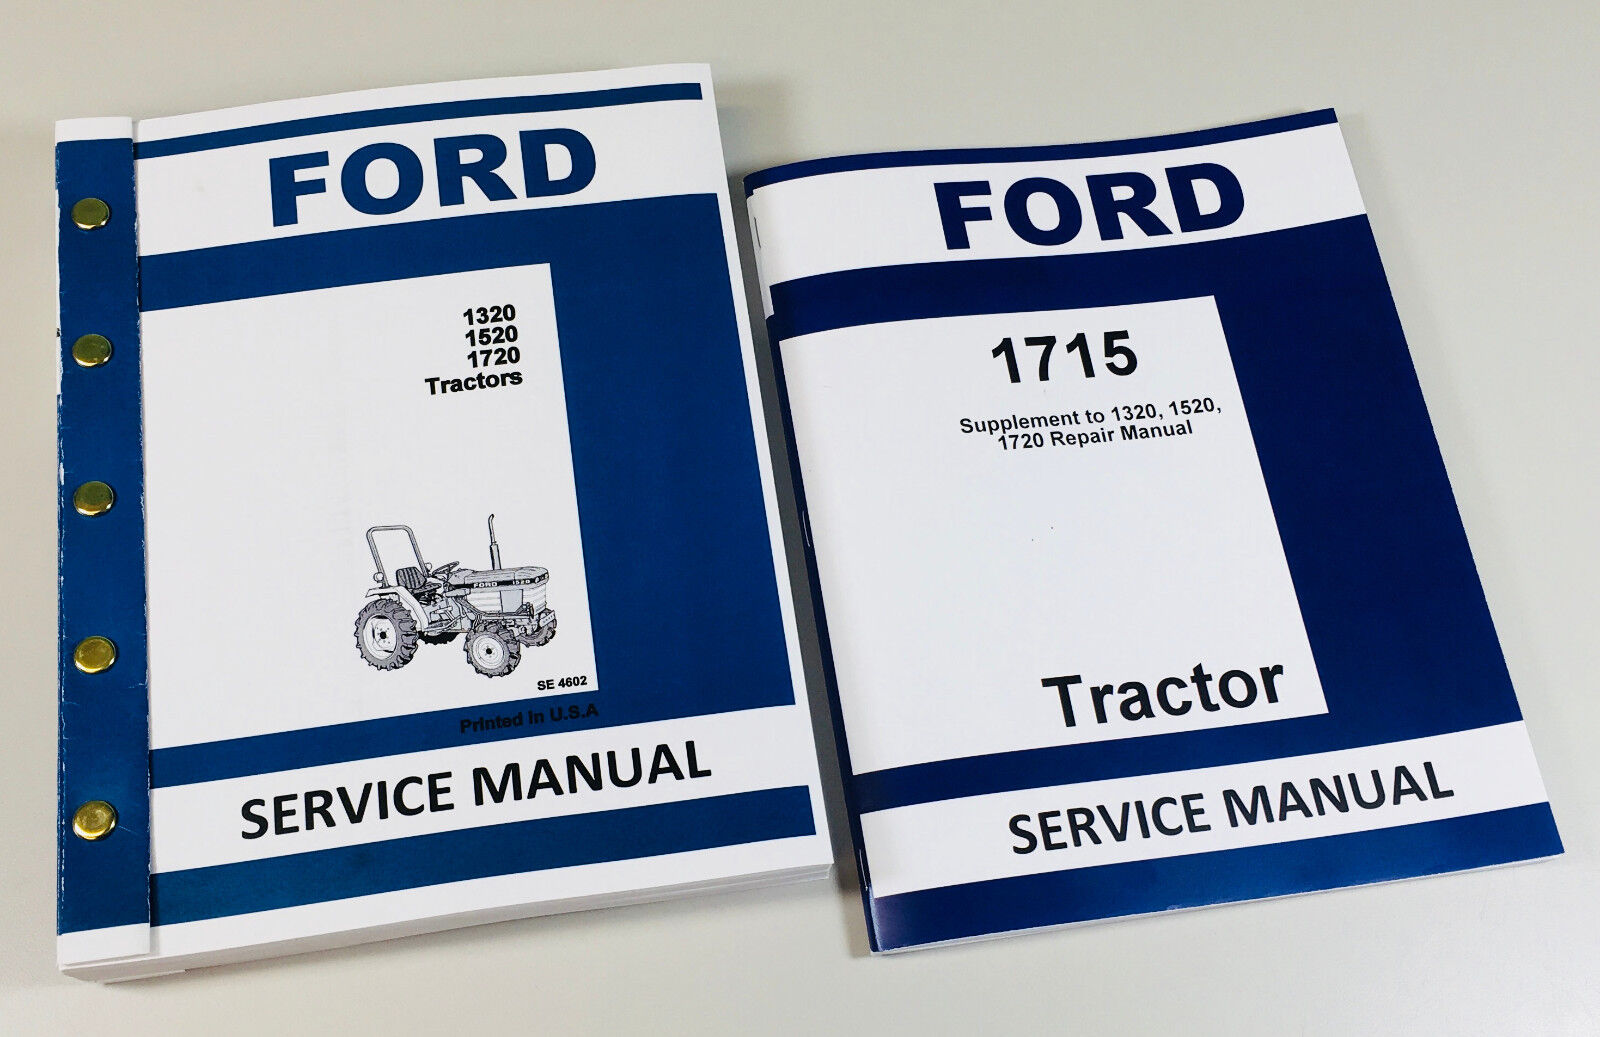 ford 1715 tractor service repair shop manual complete factory rh ebay com ford 1715 tractor repair manual ford tractor 1710 manual free